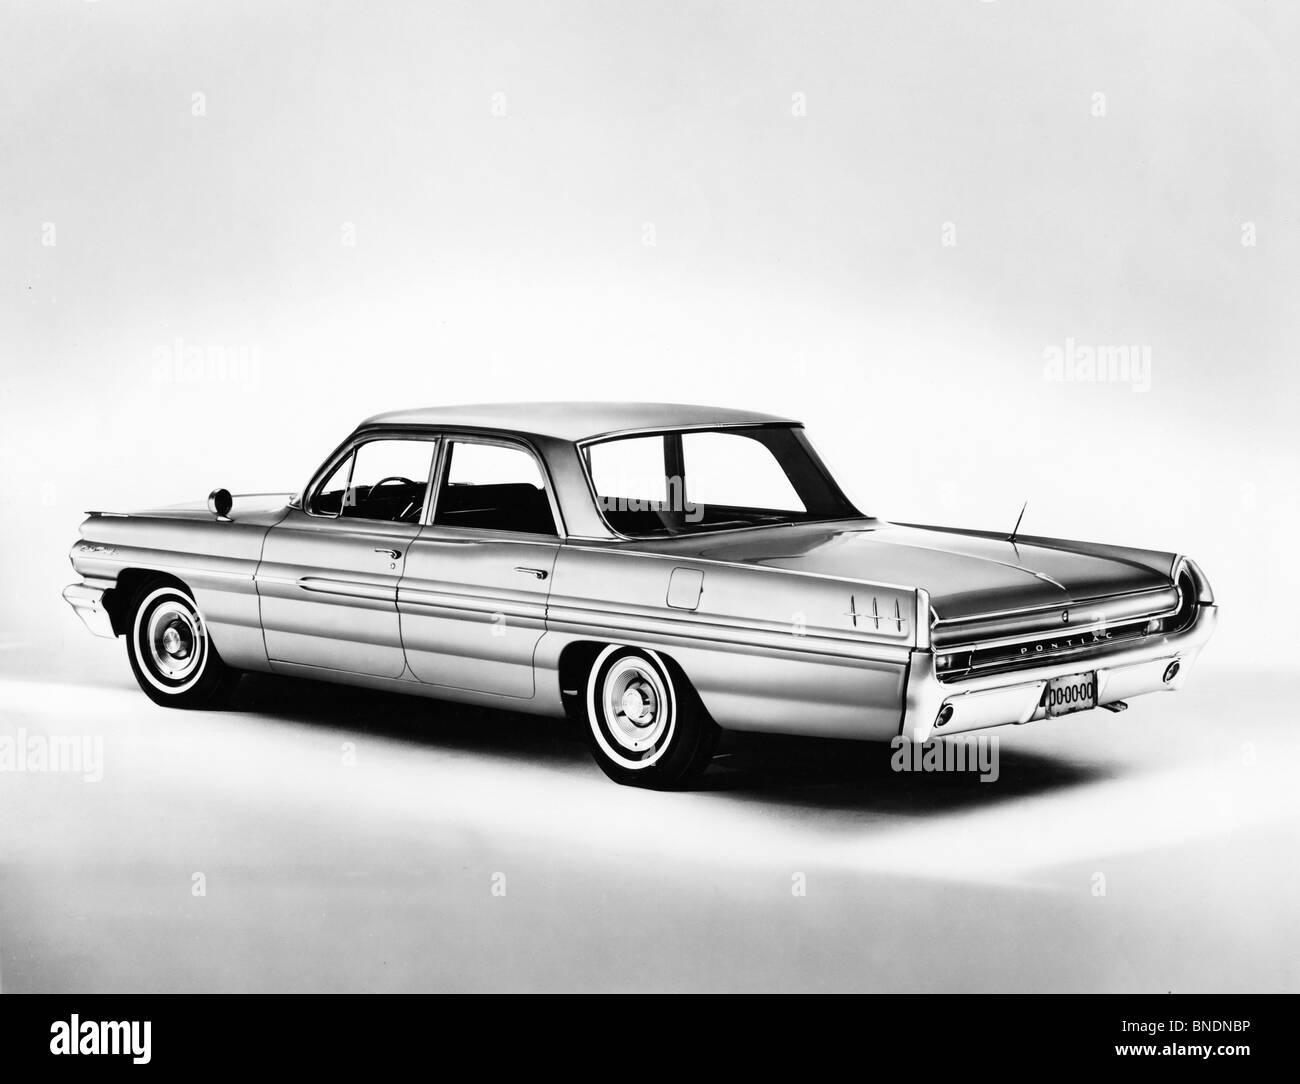 Pontiac Black And White Stock Photos Images Alamy 1960 Star Chief Close Up Of A Sedan 1962 Image